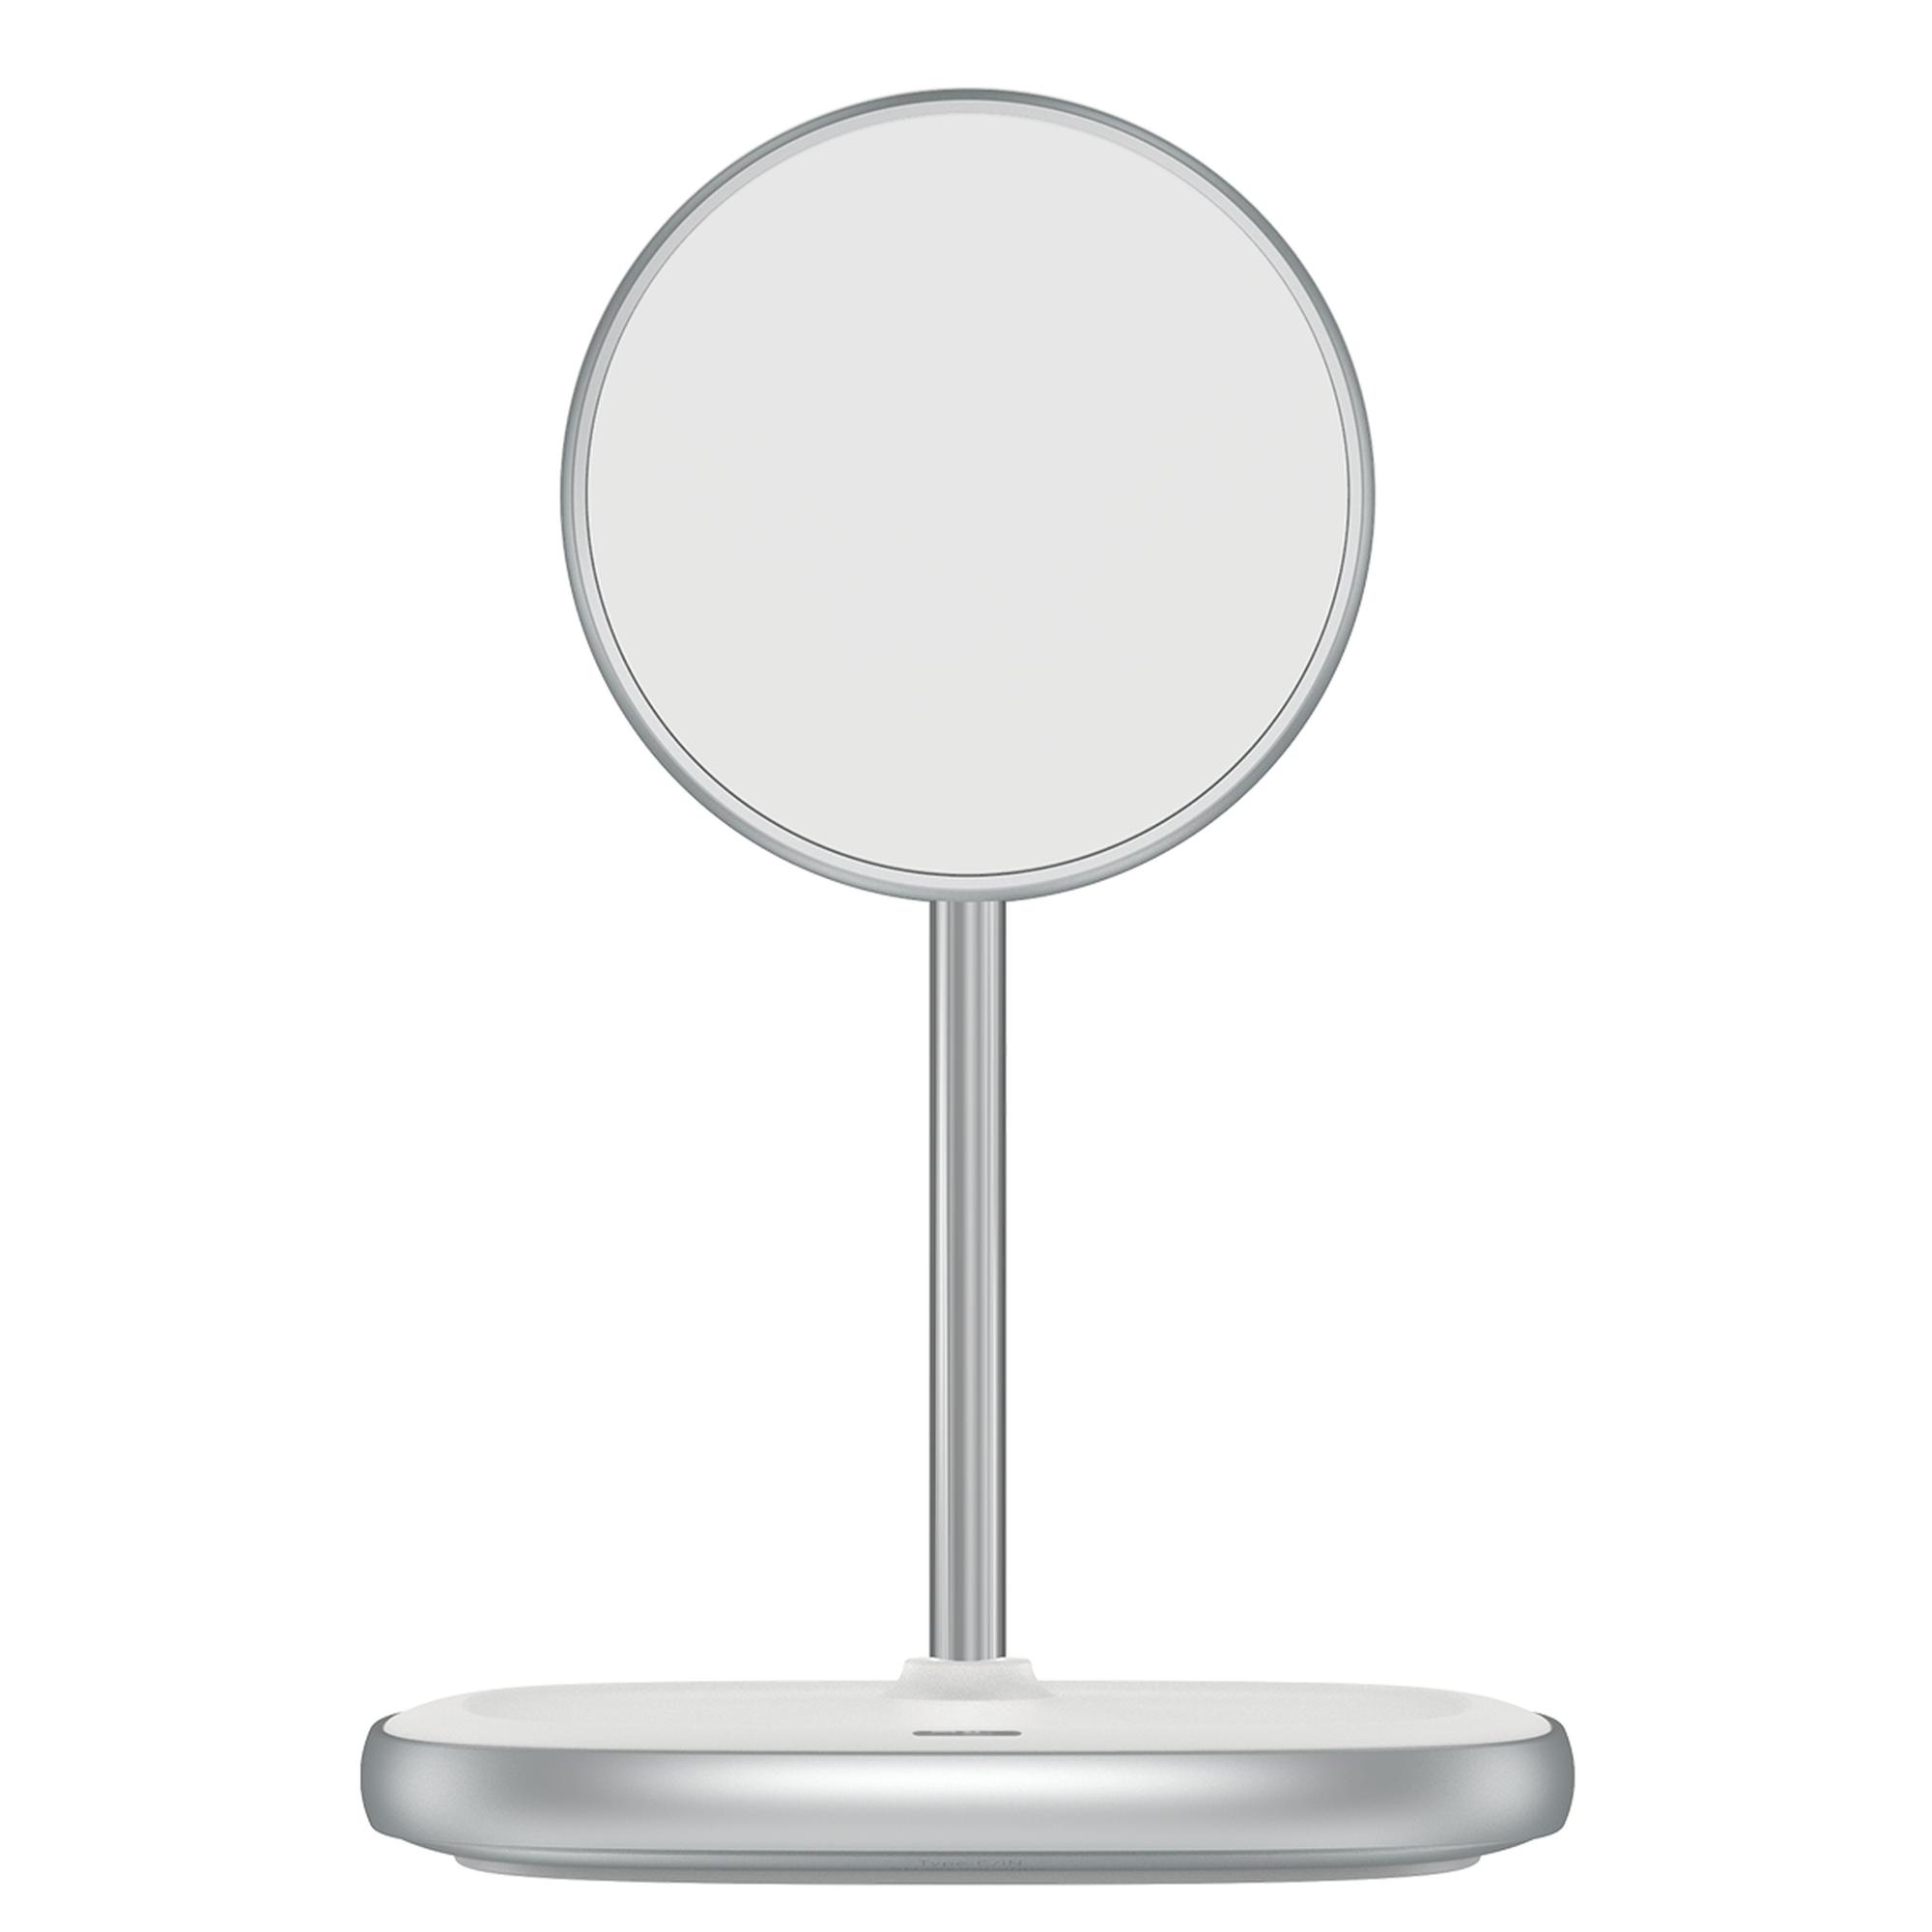 Baseus Desktop Bracket Swan MagSafe Wireless Charger 15W White